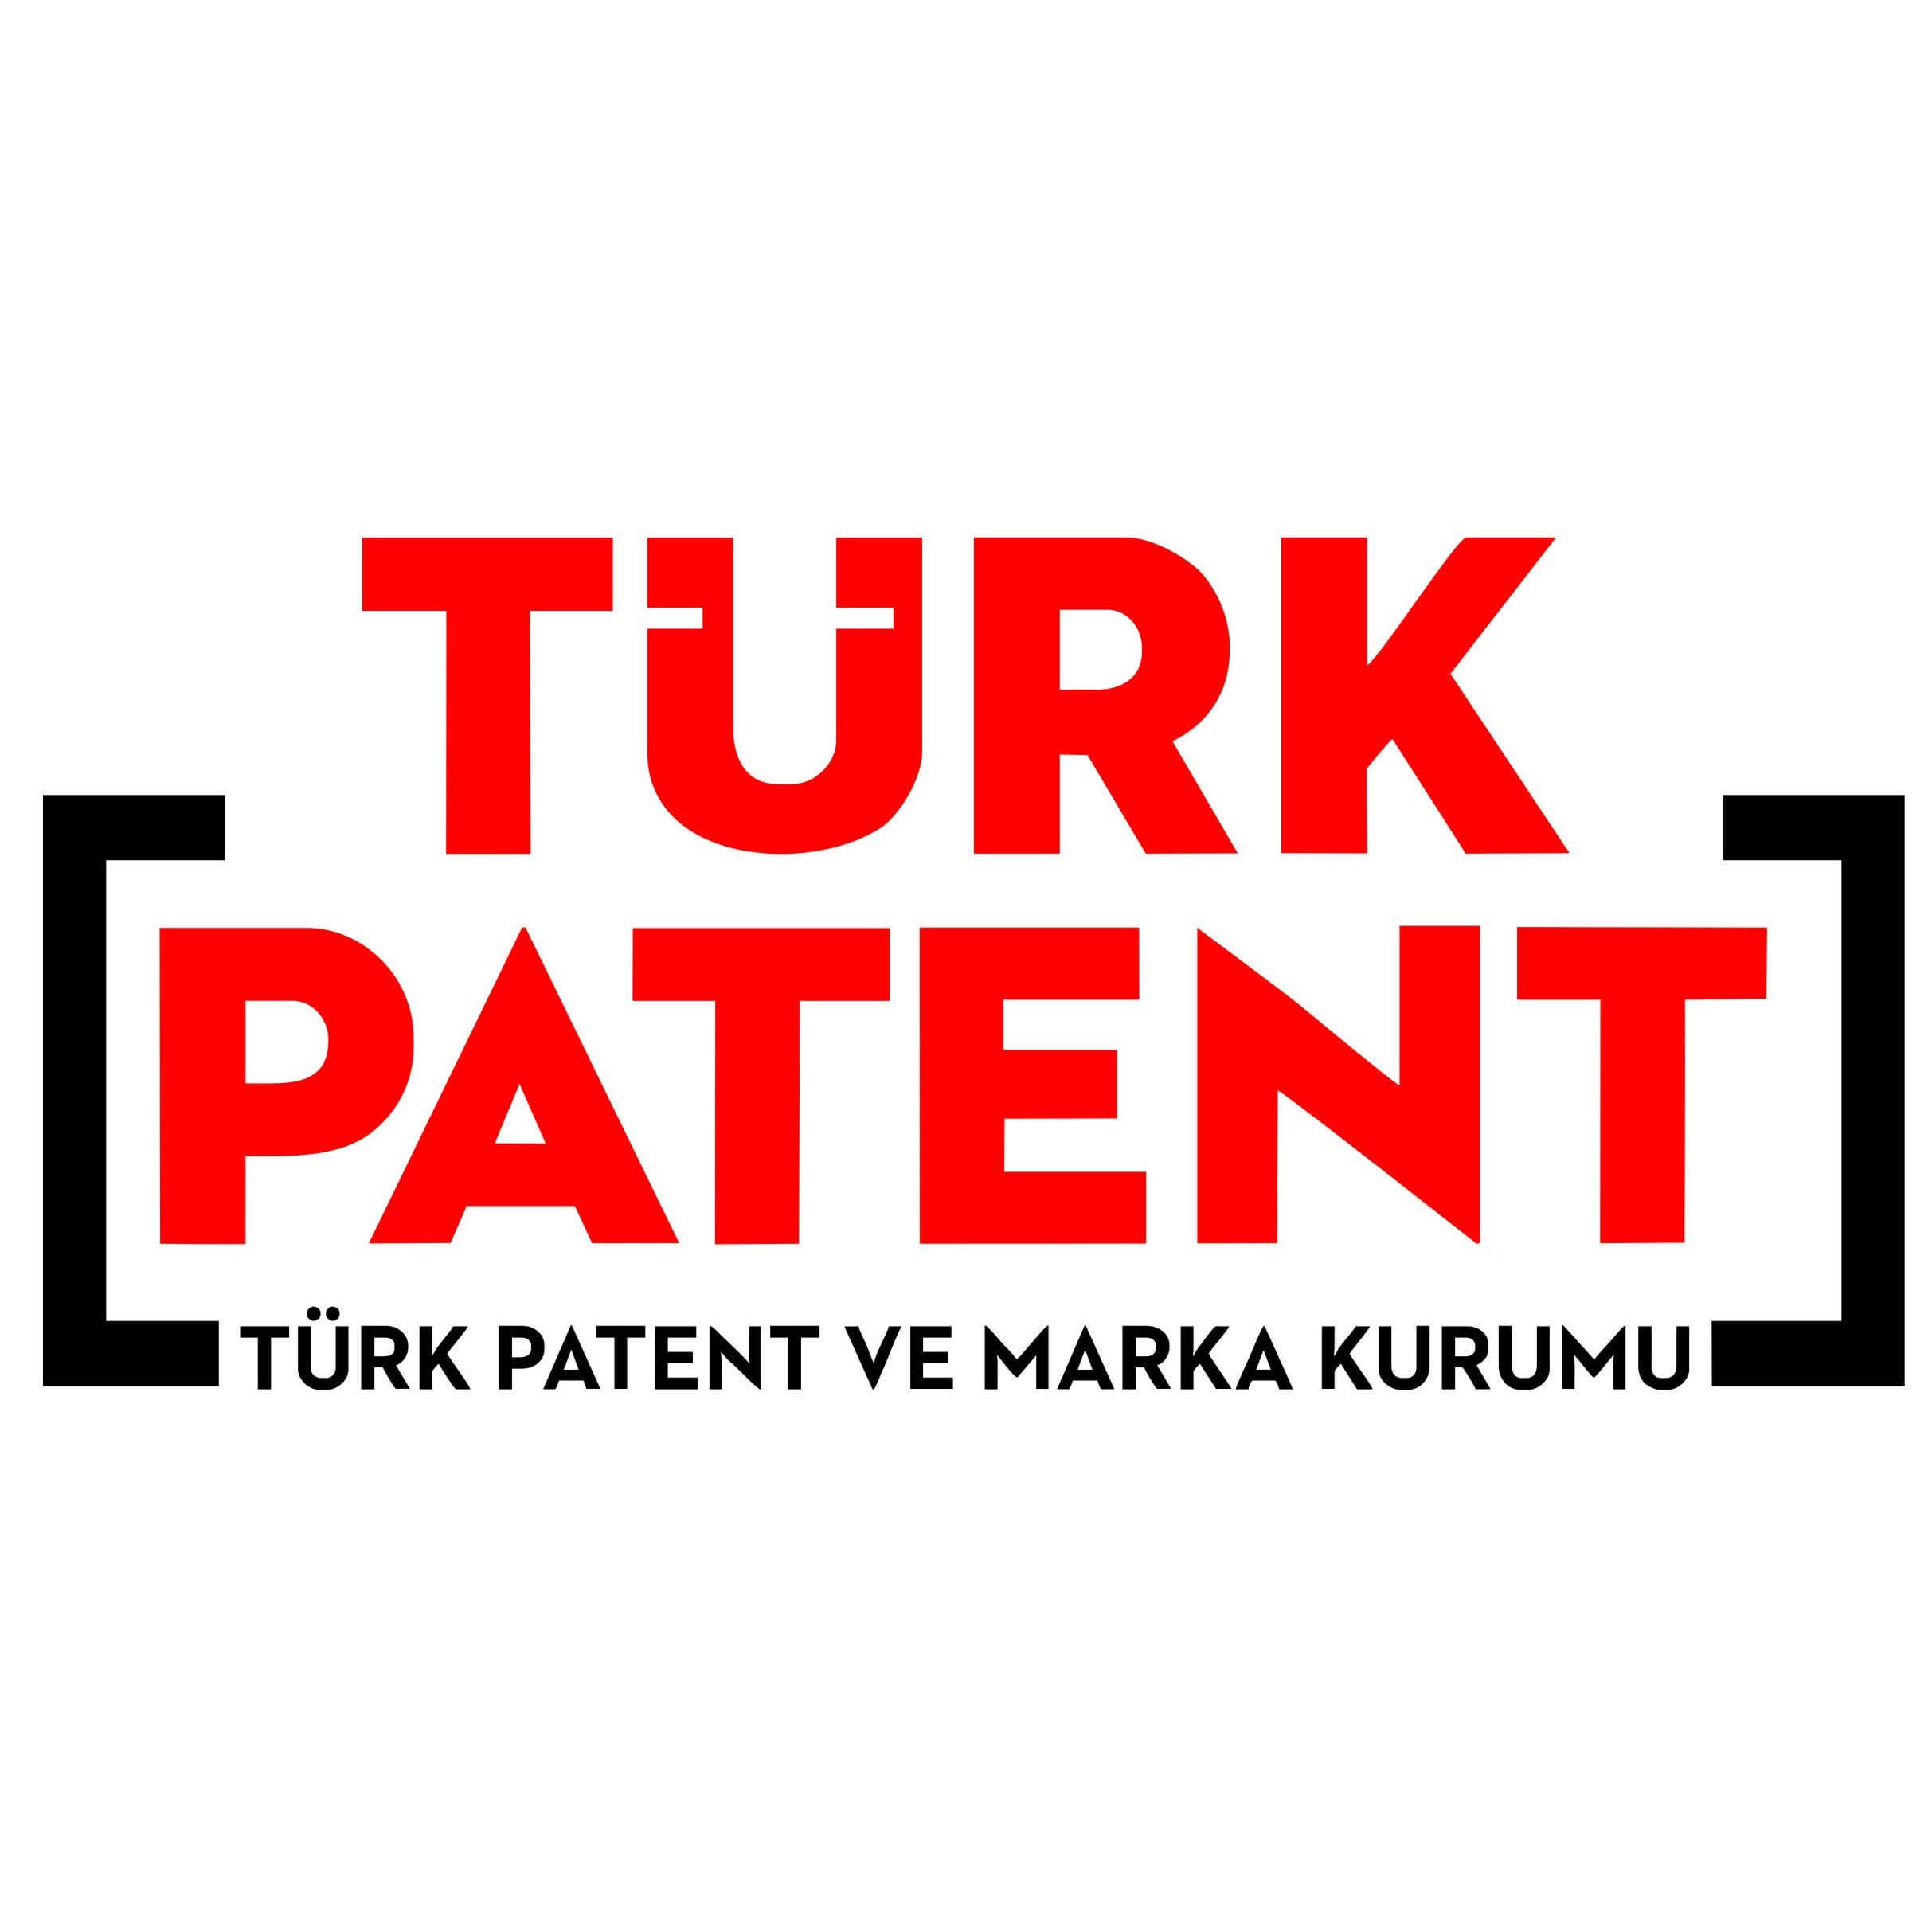 webfili-marka-ve-patent-başvurusu-hizmeti-Alanya-01 jpg